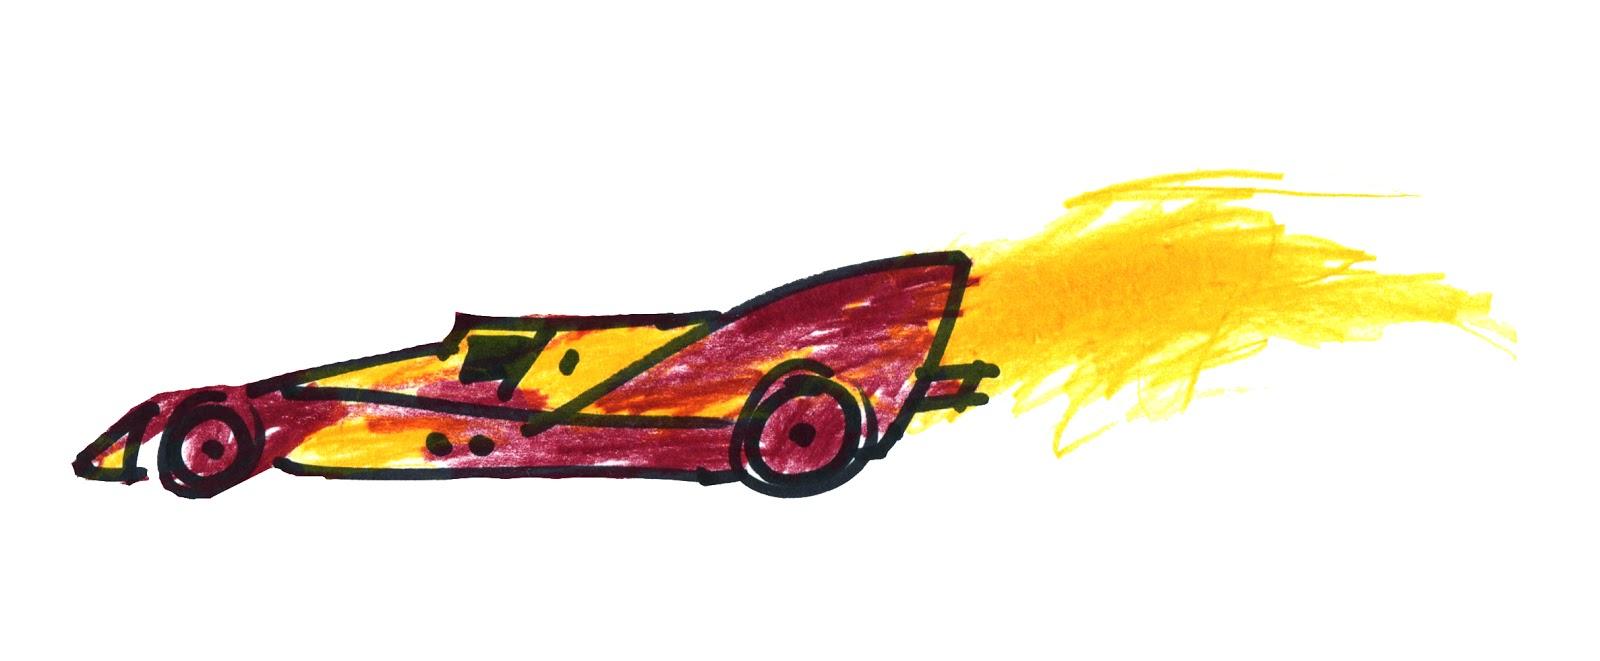 1600x661 An Open [Sketch]book A Very Fast Car